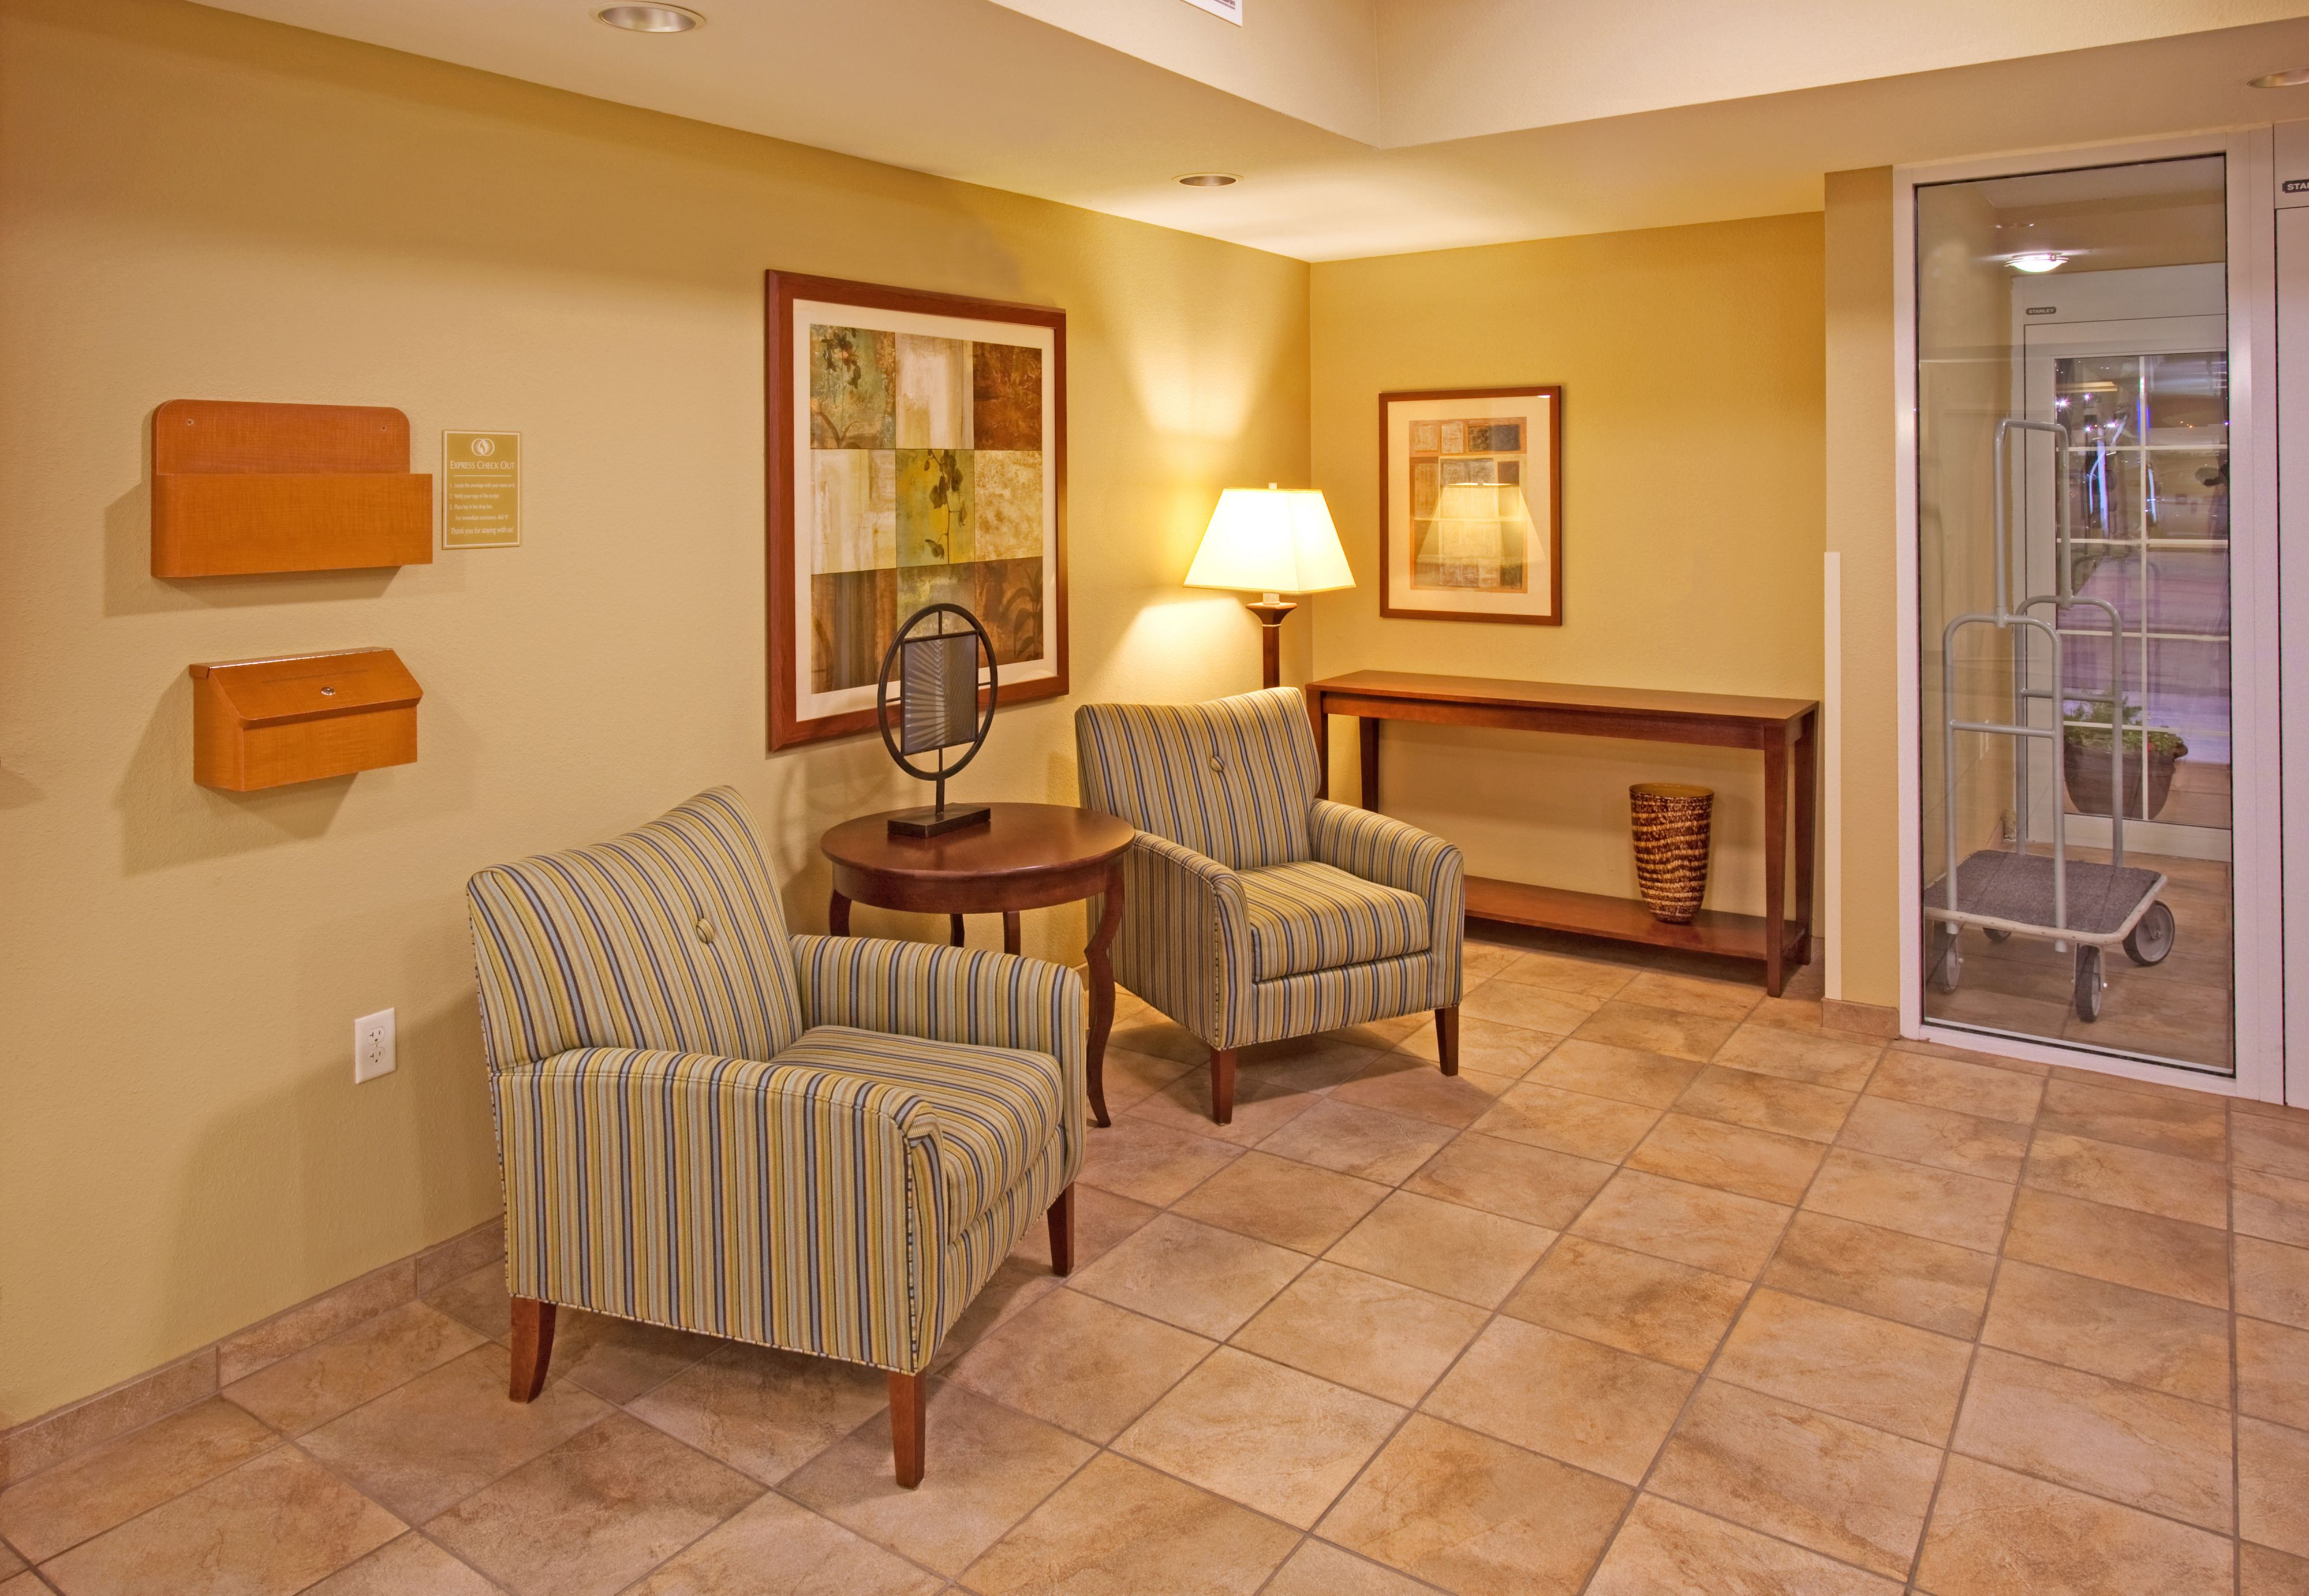 Candlewood Suites Bellevue image 3